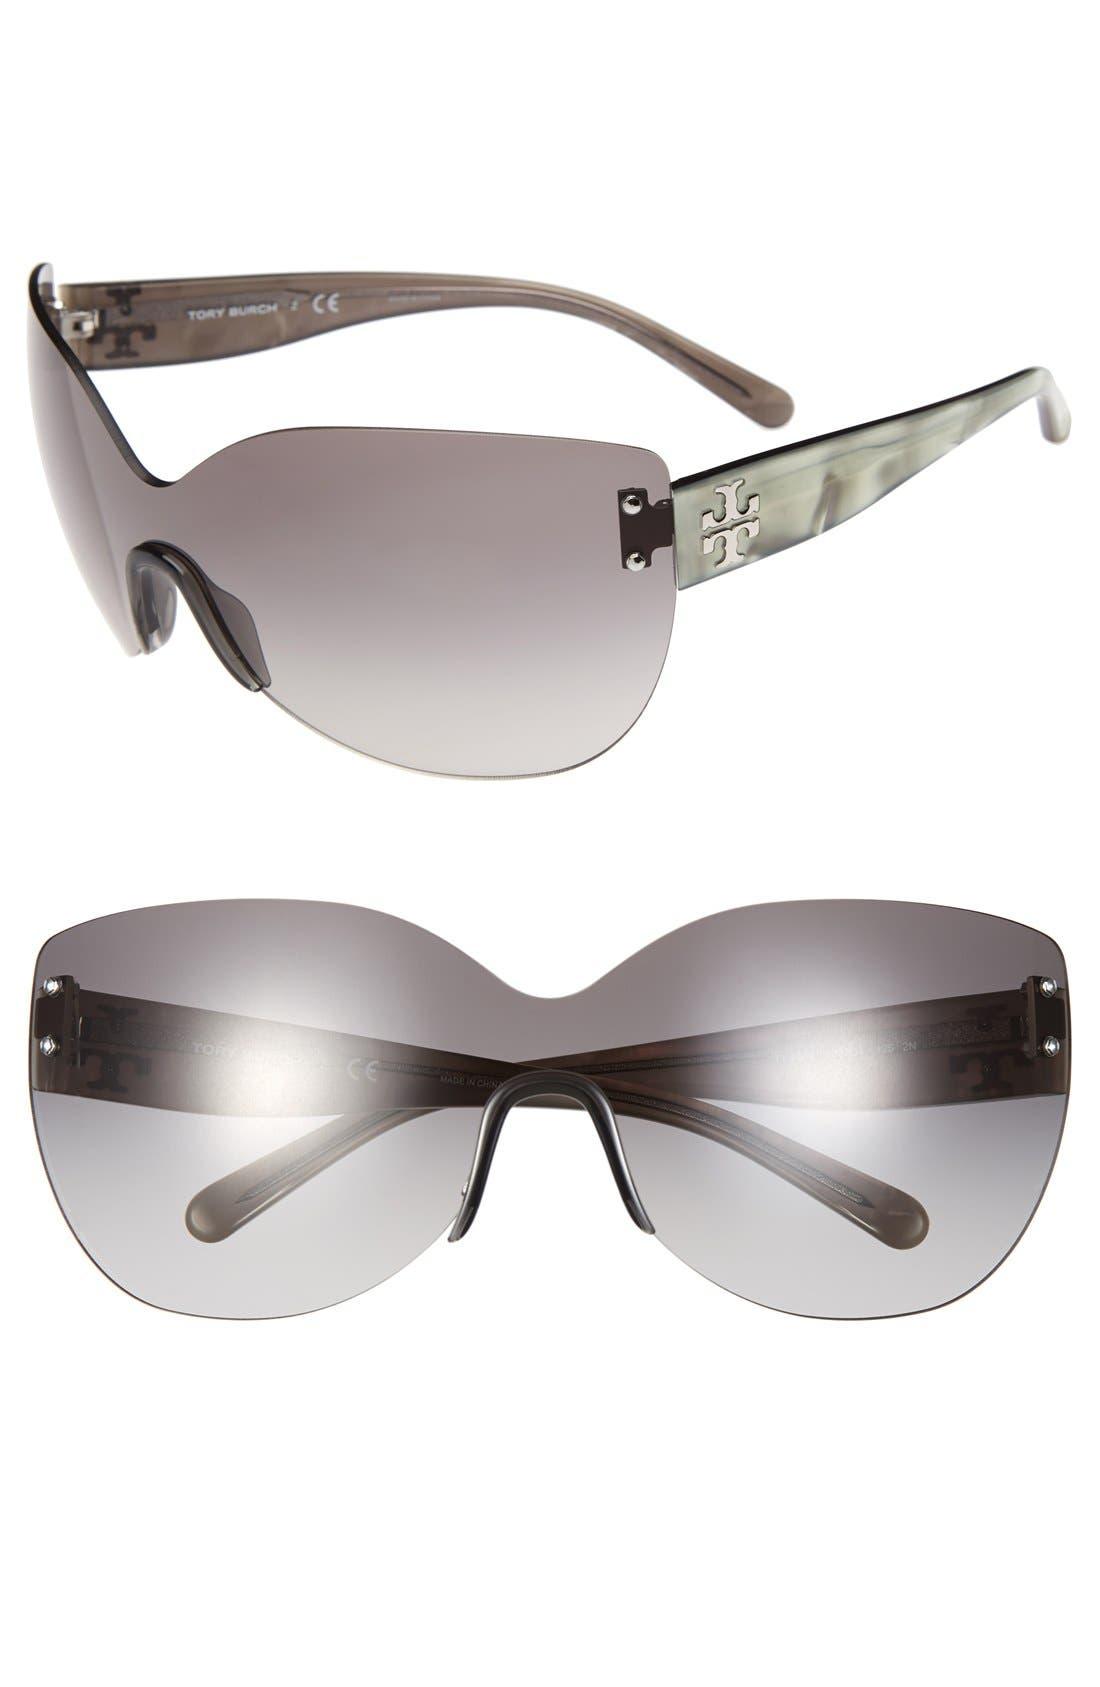 Main Image - Tory Burch 'Pilot' 70mm Wrap Sunglasses